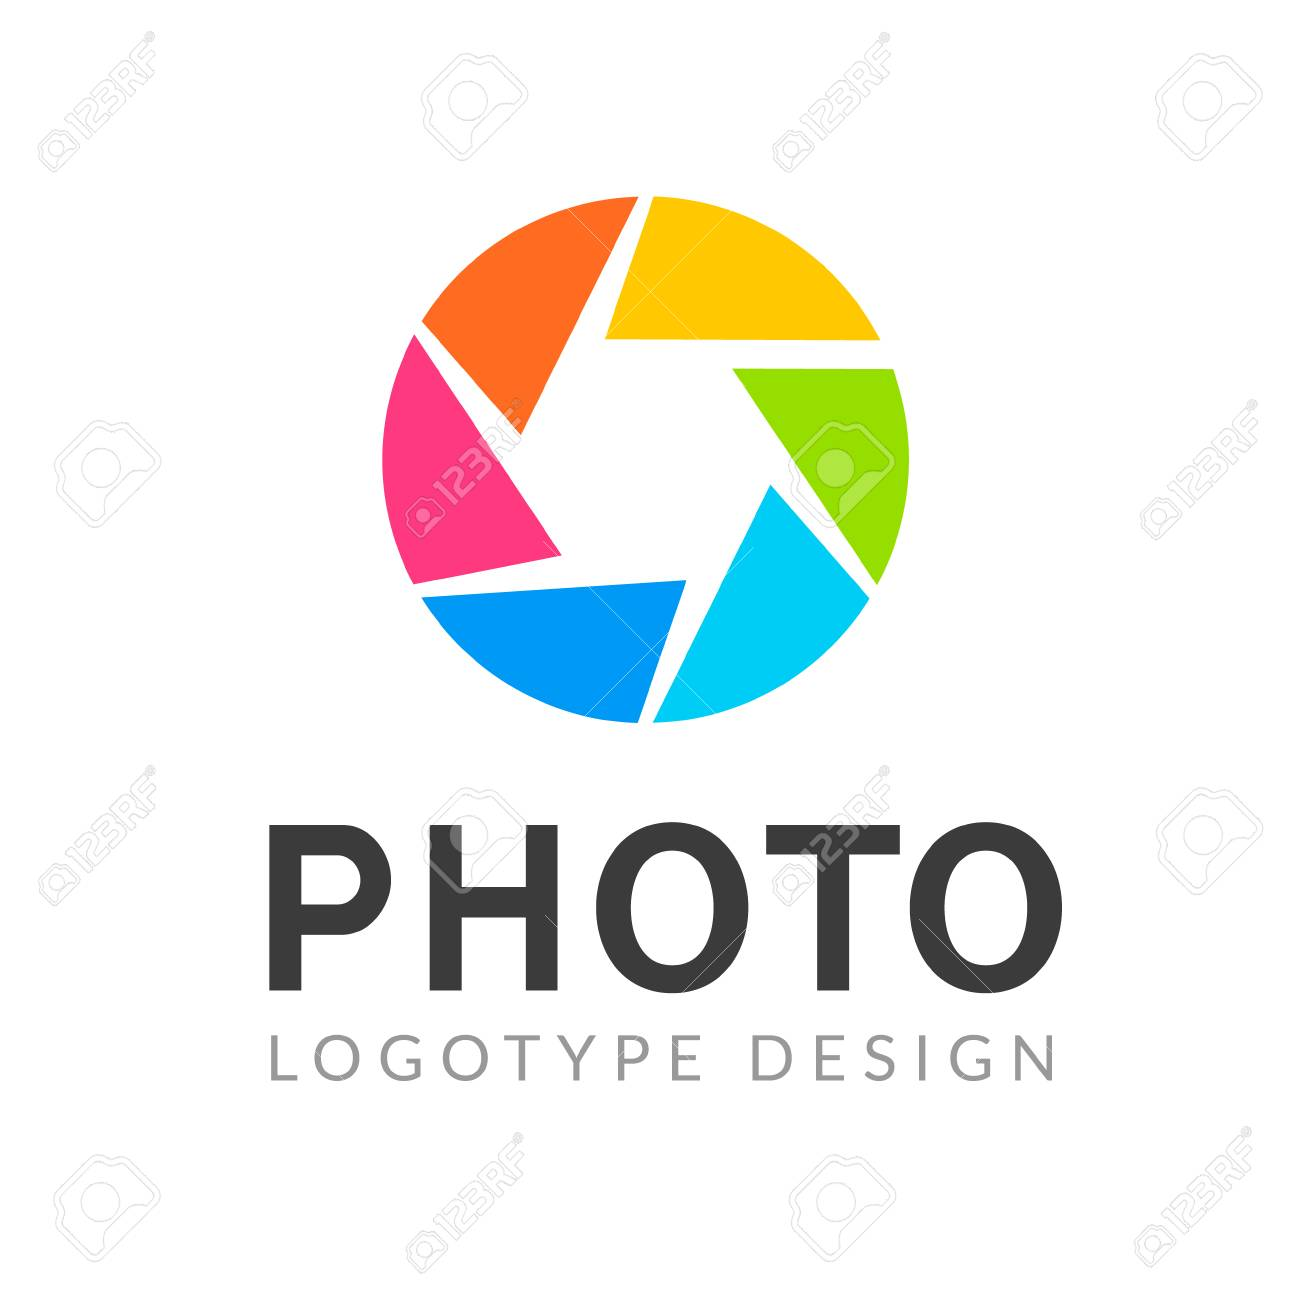 Photography logo template modern vector creative symbol. Shutter lens camera icon design element. - 116378251